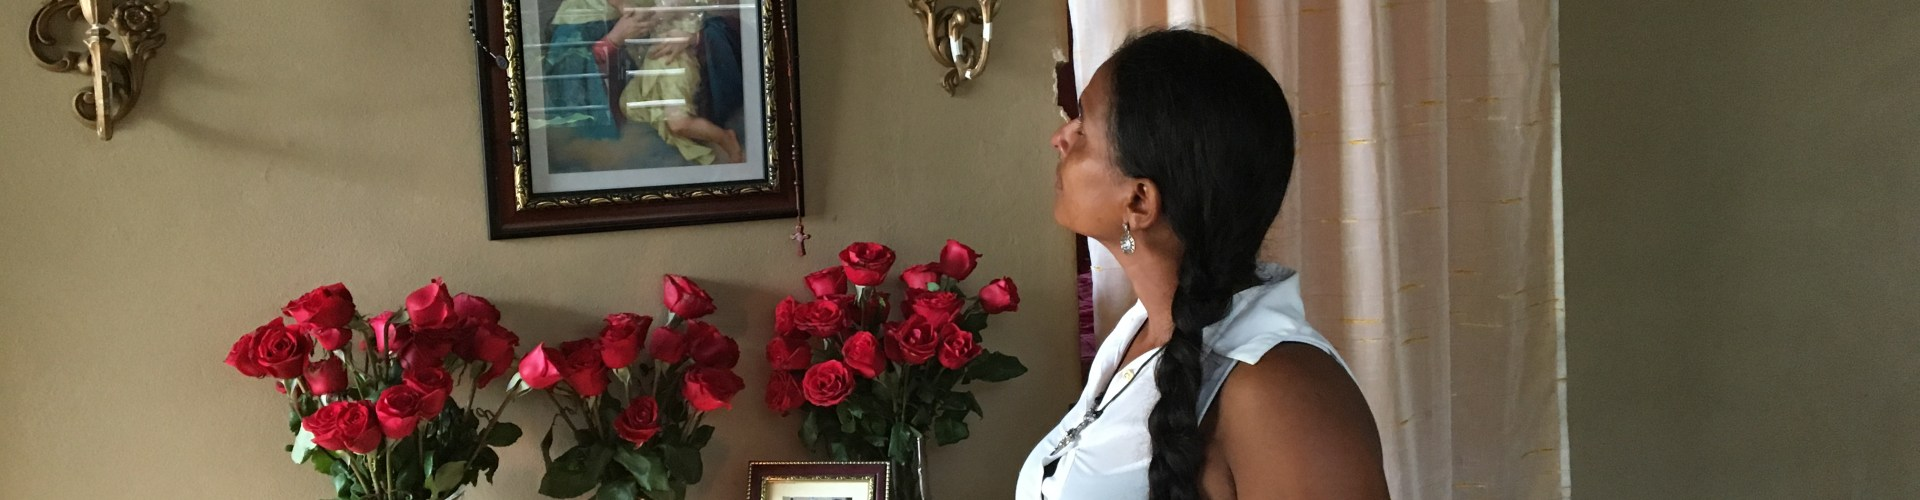 Madre de Emely desconfía investigación